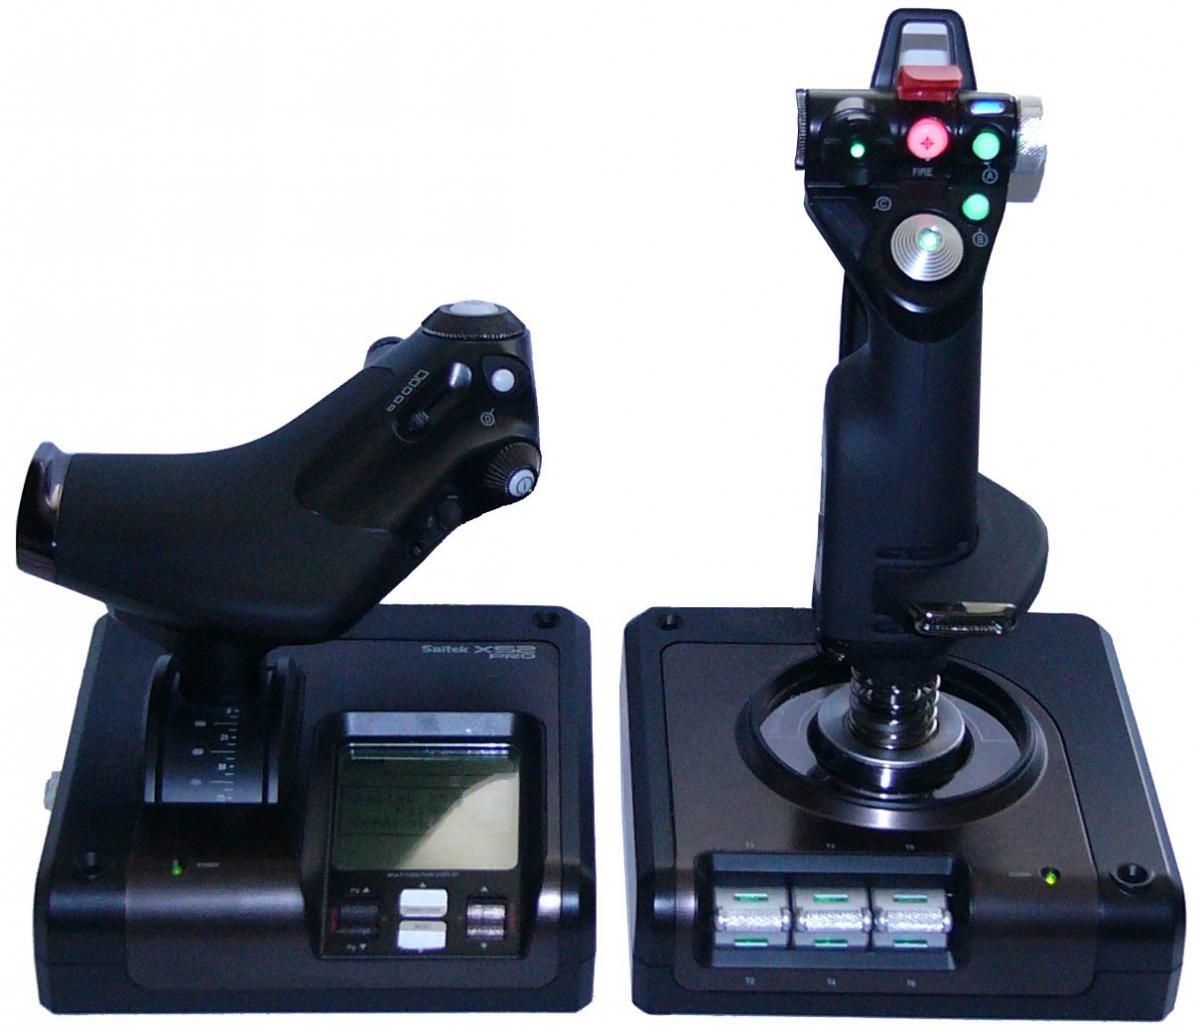 Nombre:  saitek-x52-pro-stick-and-throttle.jpg Visitas: 496 Tamaño: 94.7 KB